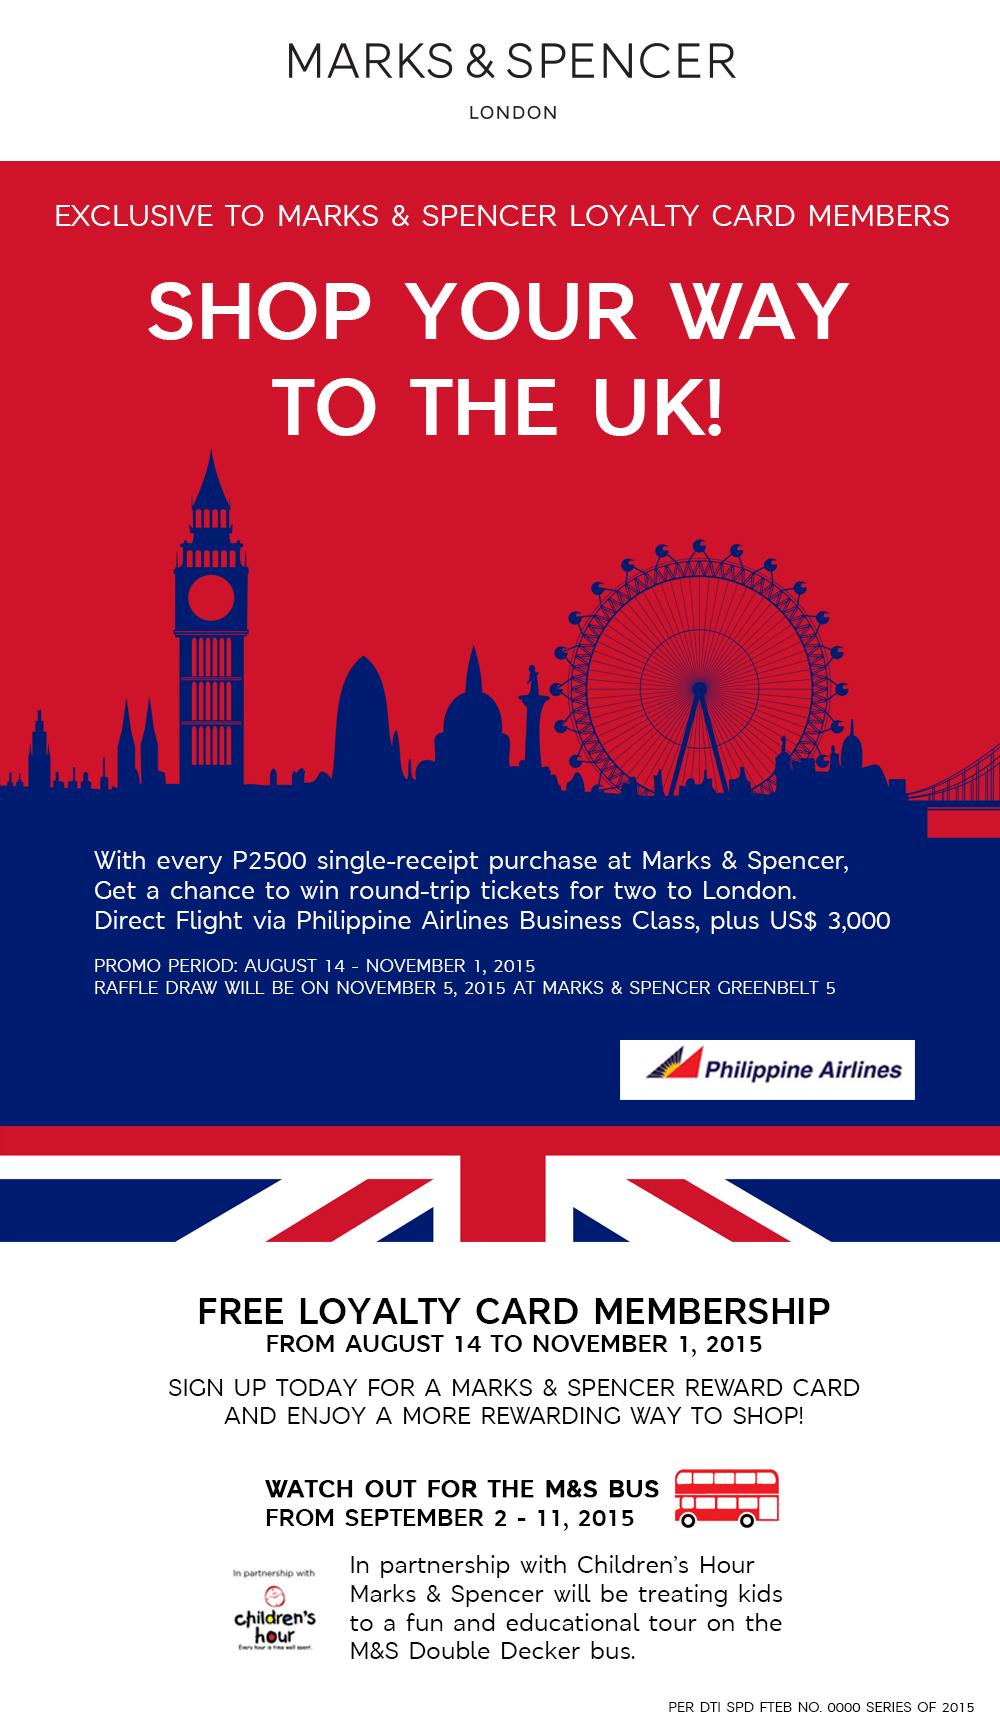 MS-LondonTrip-Promo-Ad21